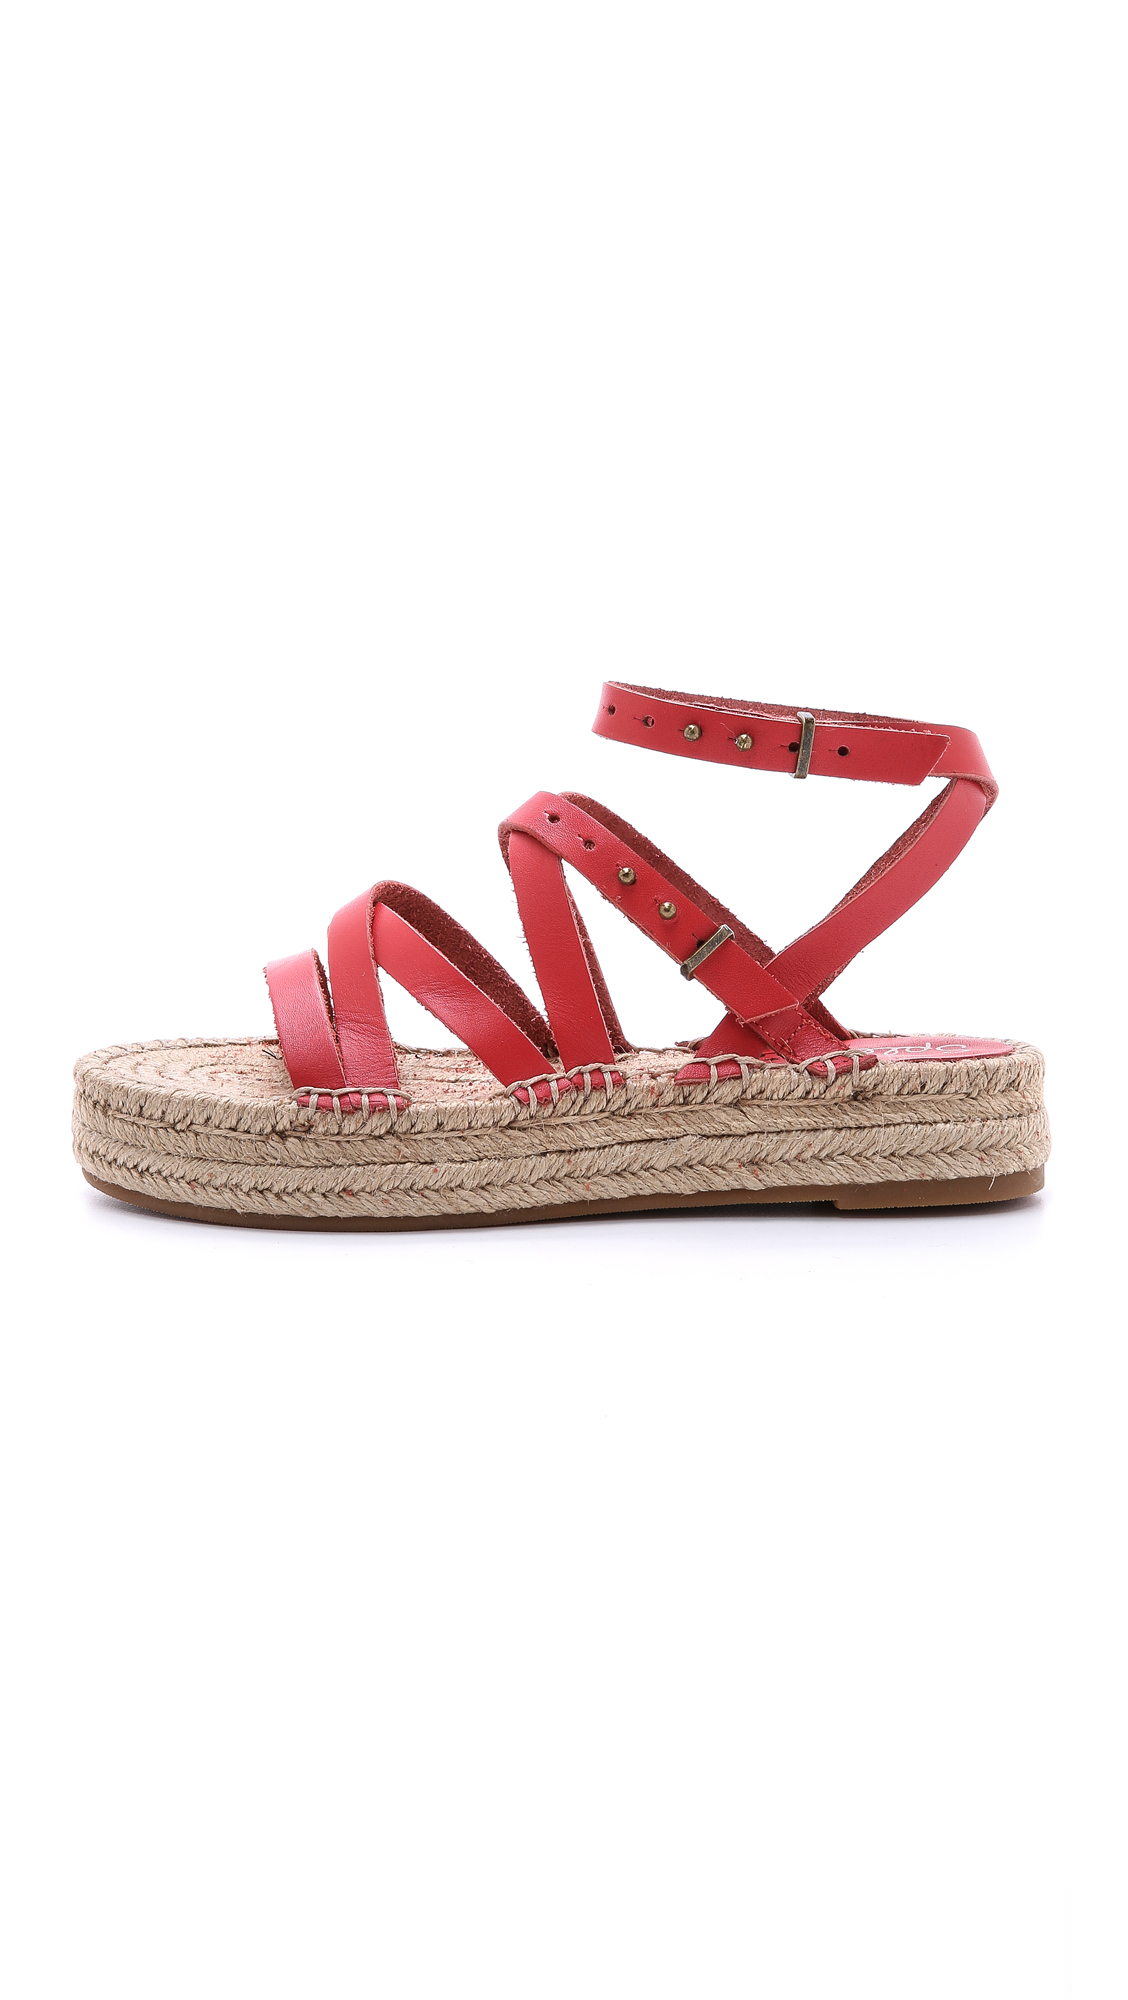 Lyst Splendid Erin Double Espadrille Sandals Red In Red